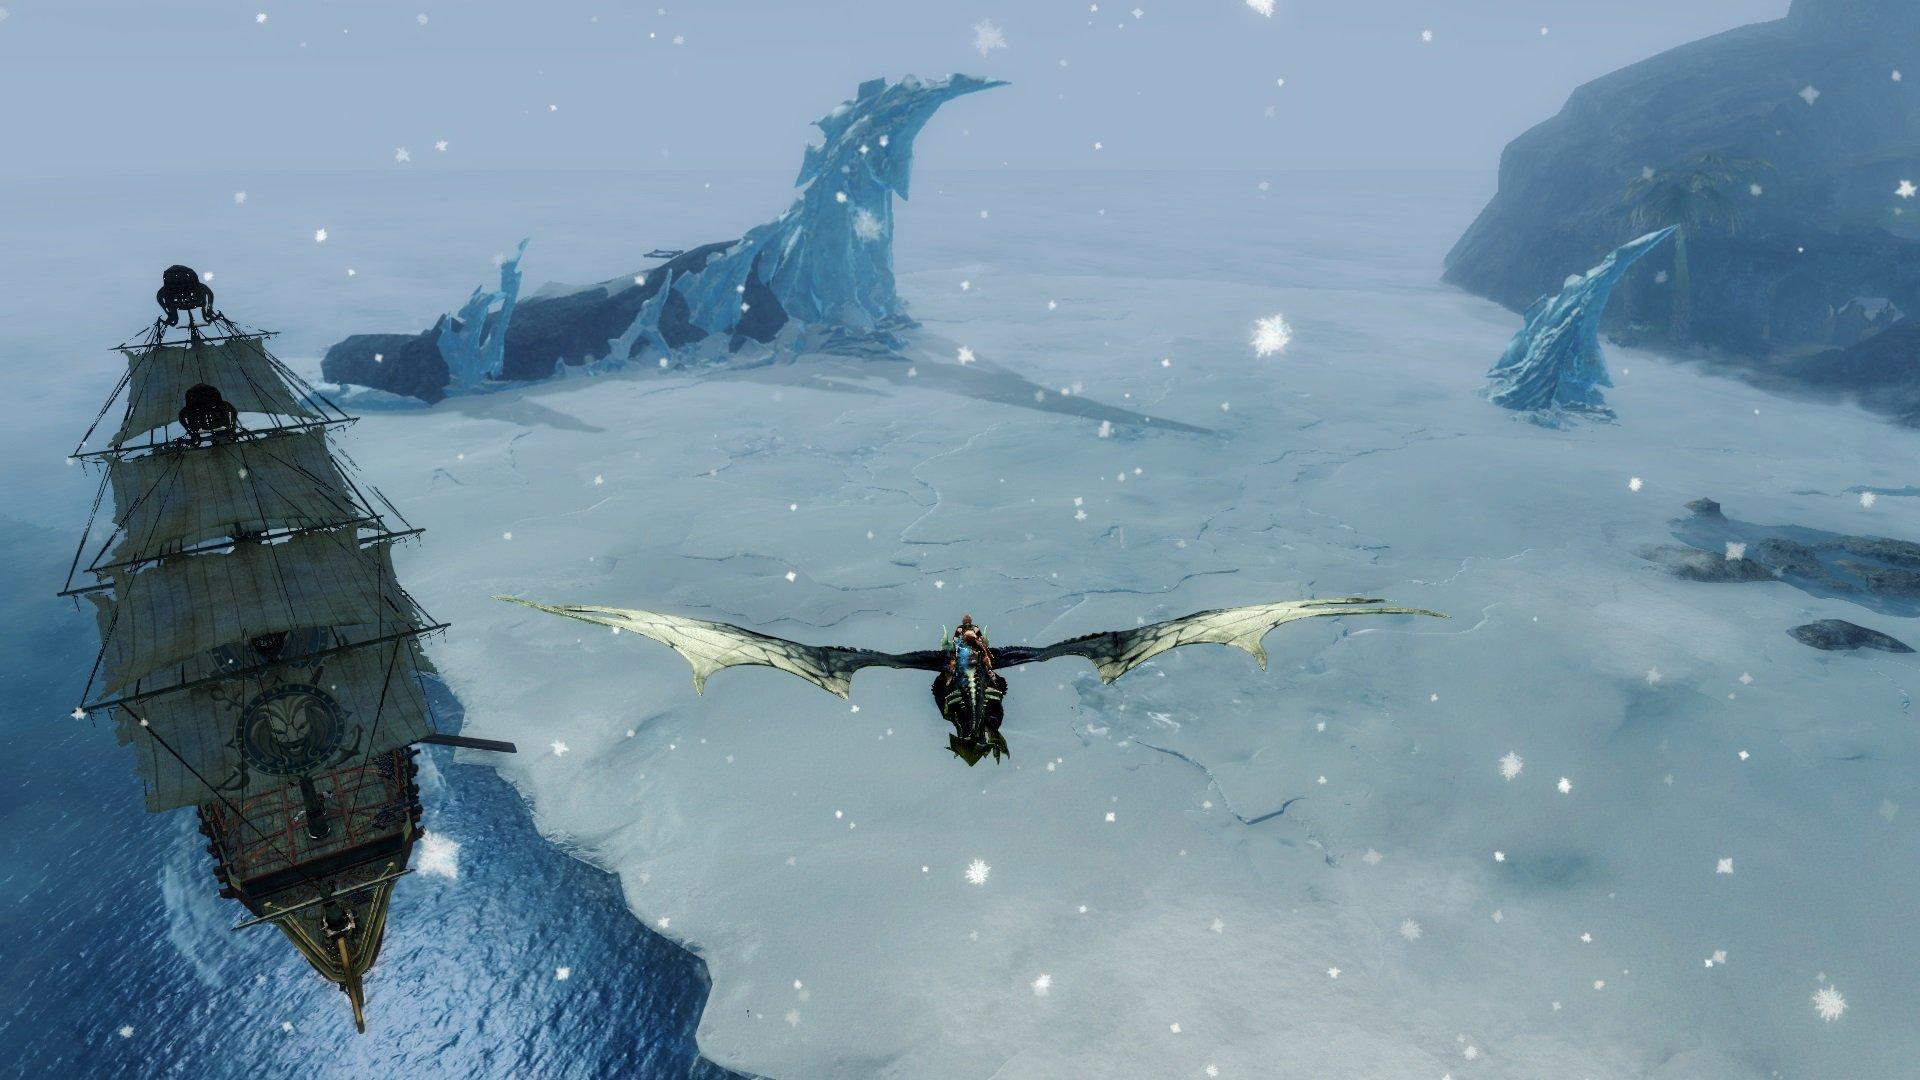 Guild Wars 2 Balance - Champions - The Icebrood Saga Finale 7